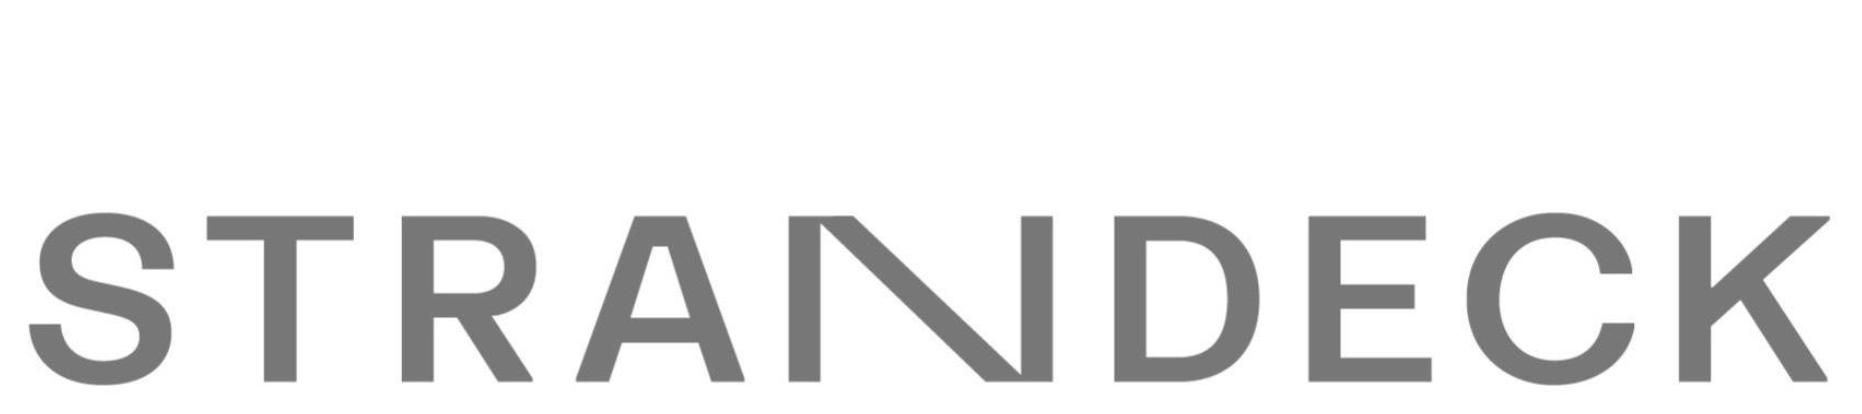 Strandeck Logo with top margin